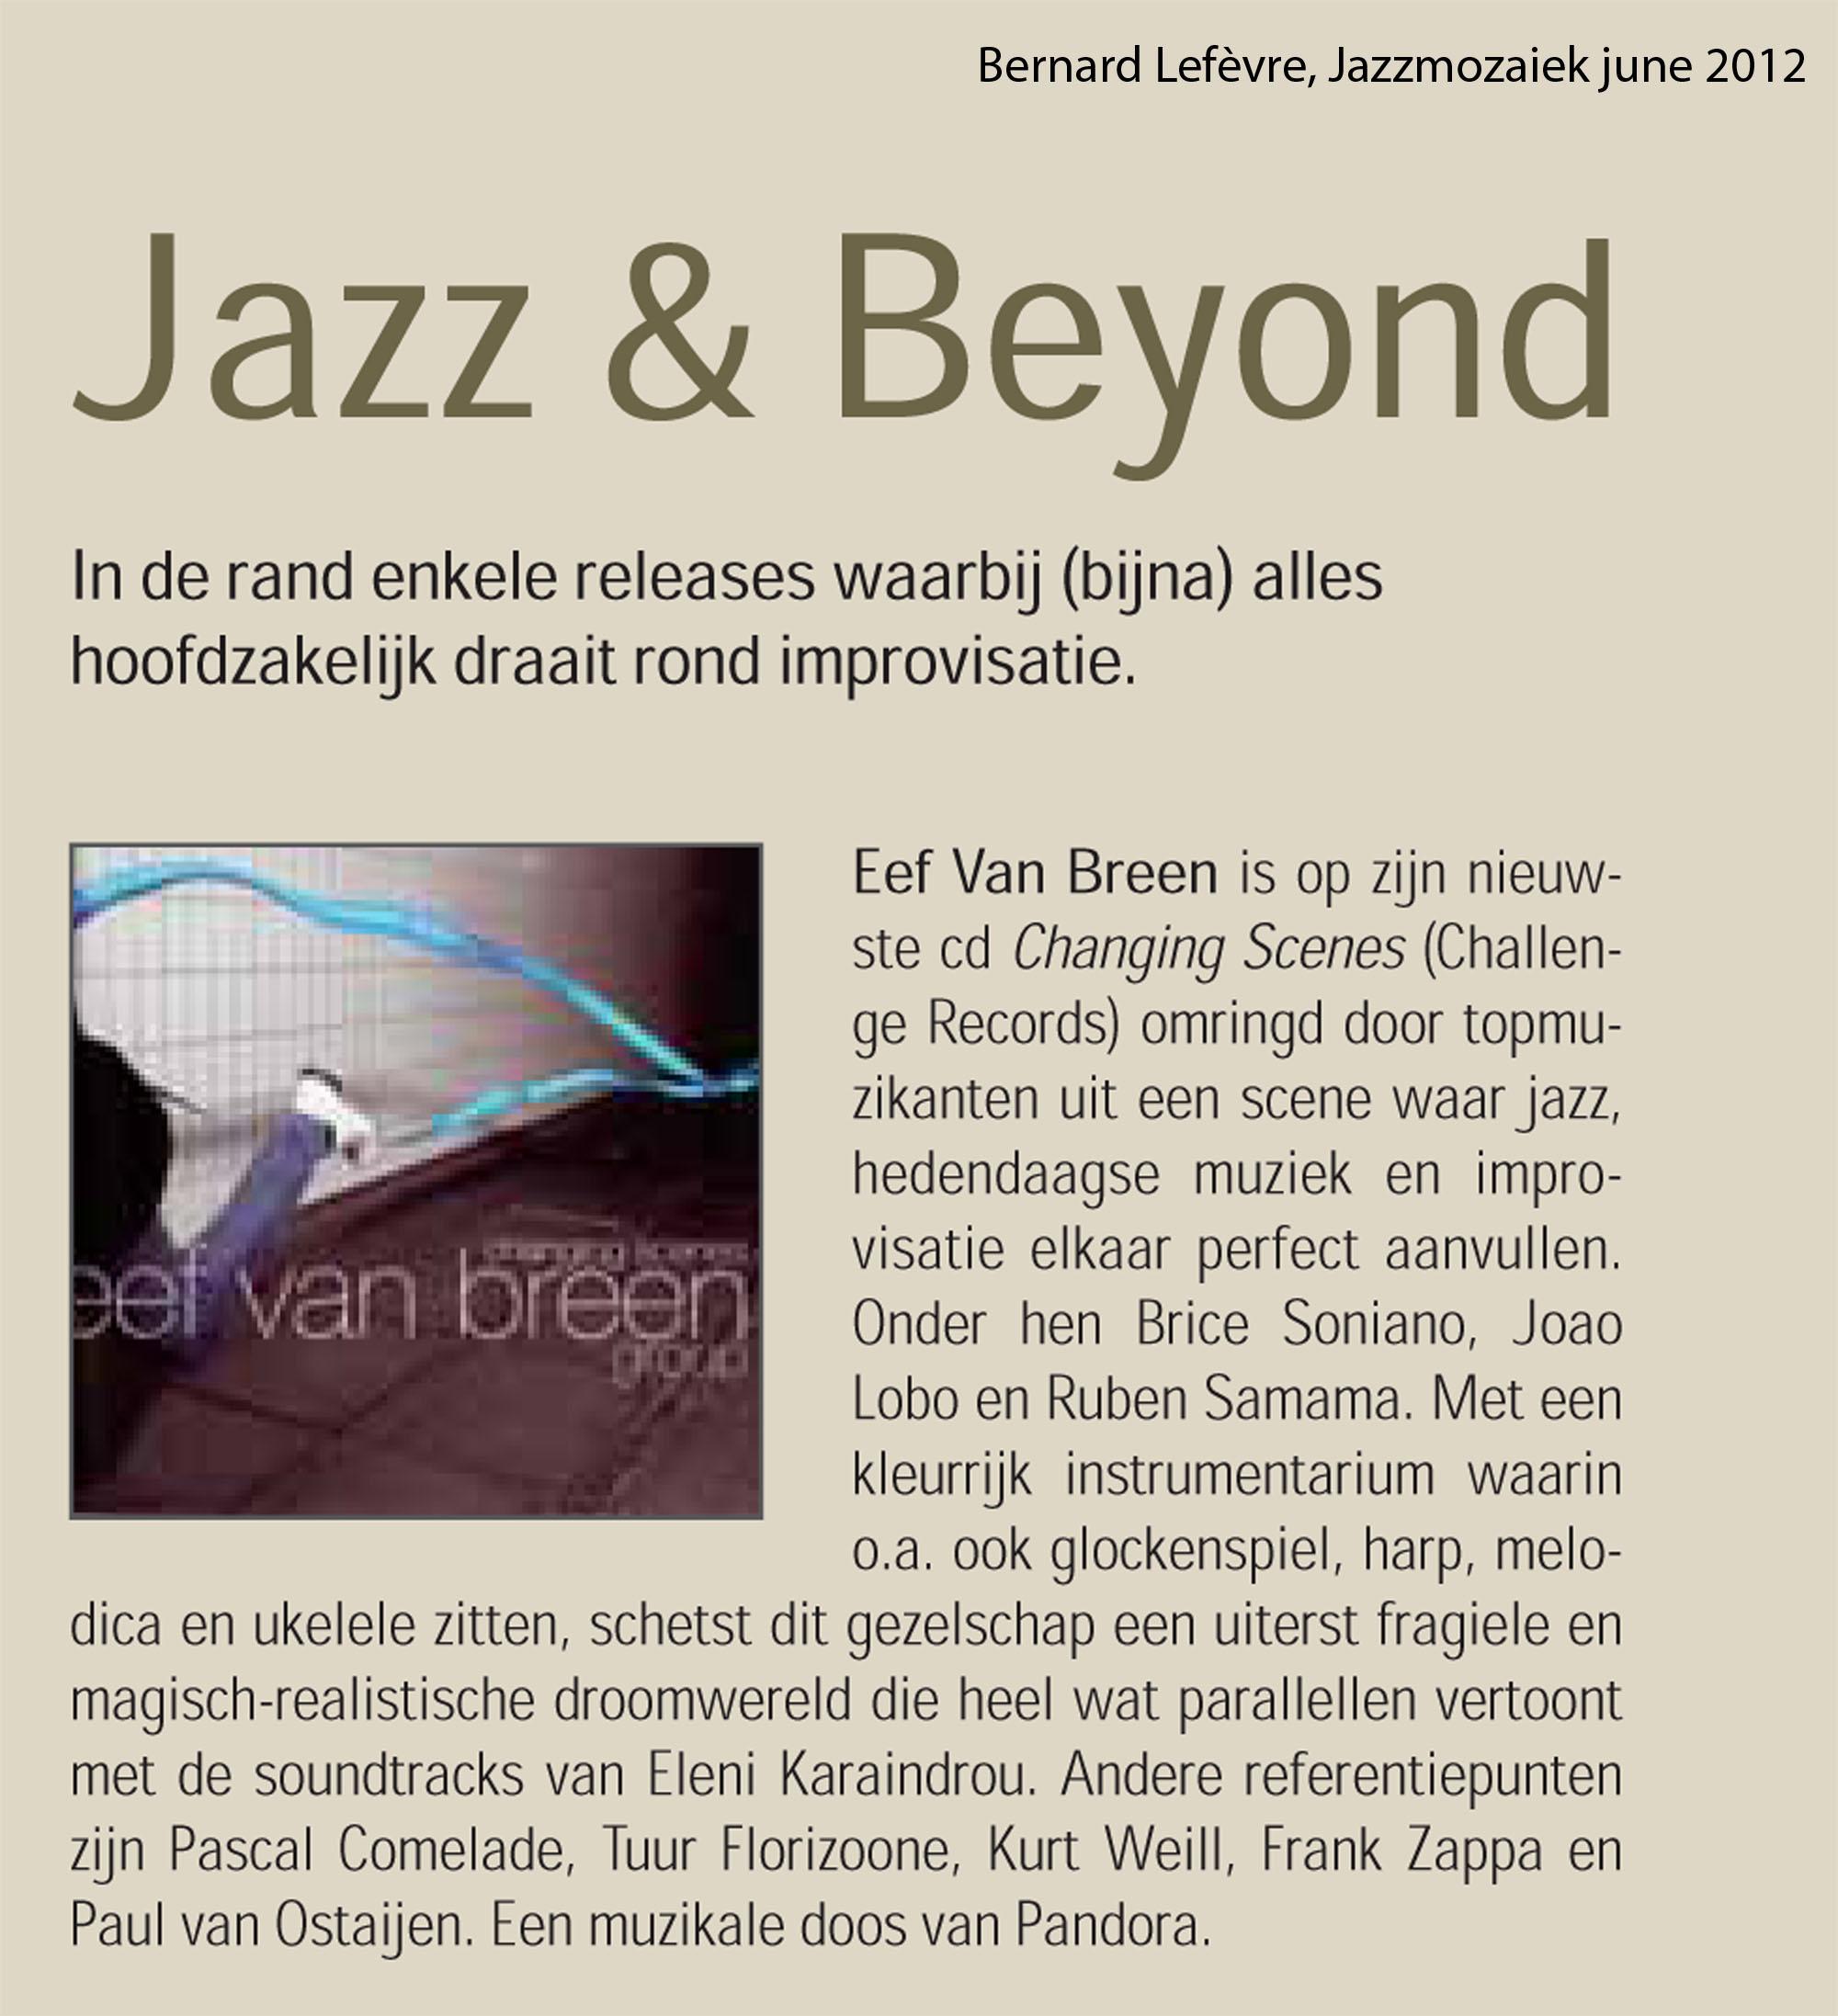 Jazzmozaiek 2012